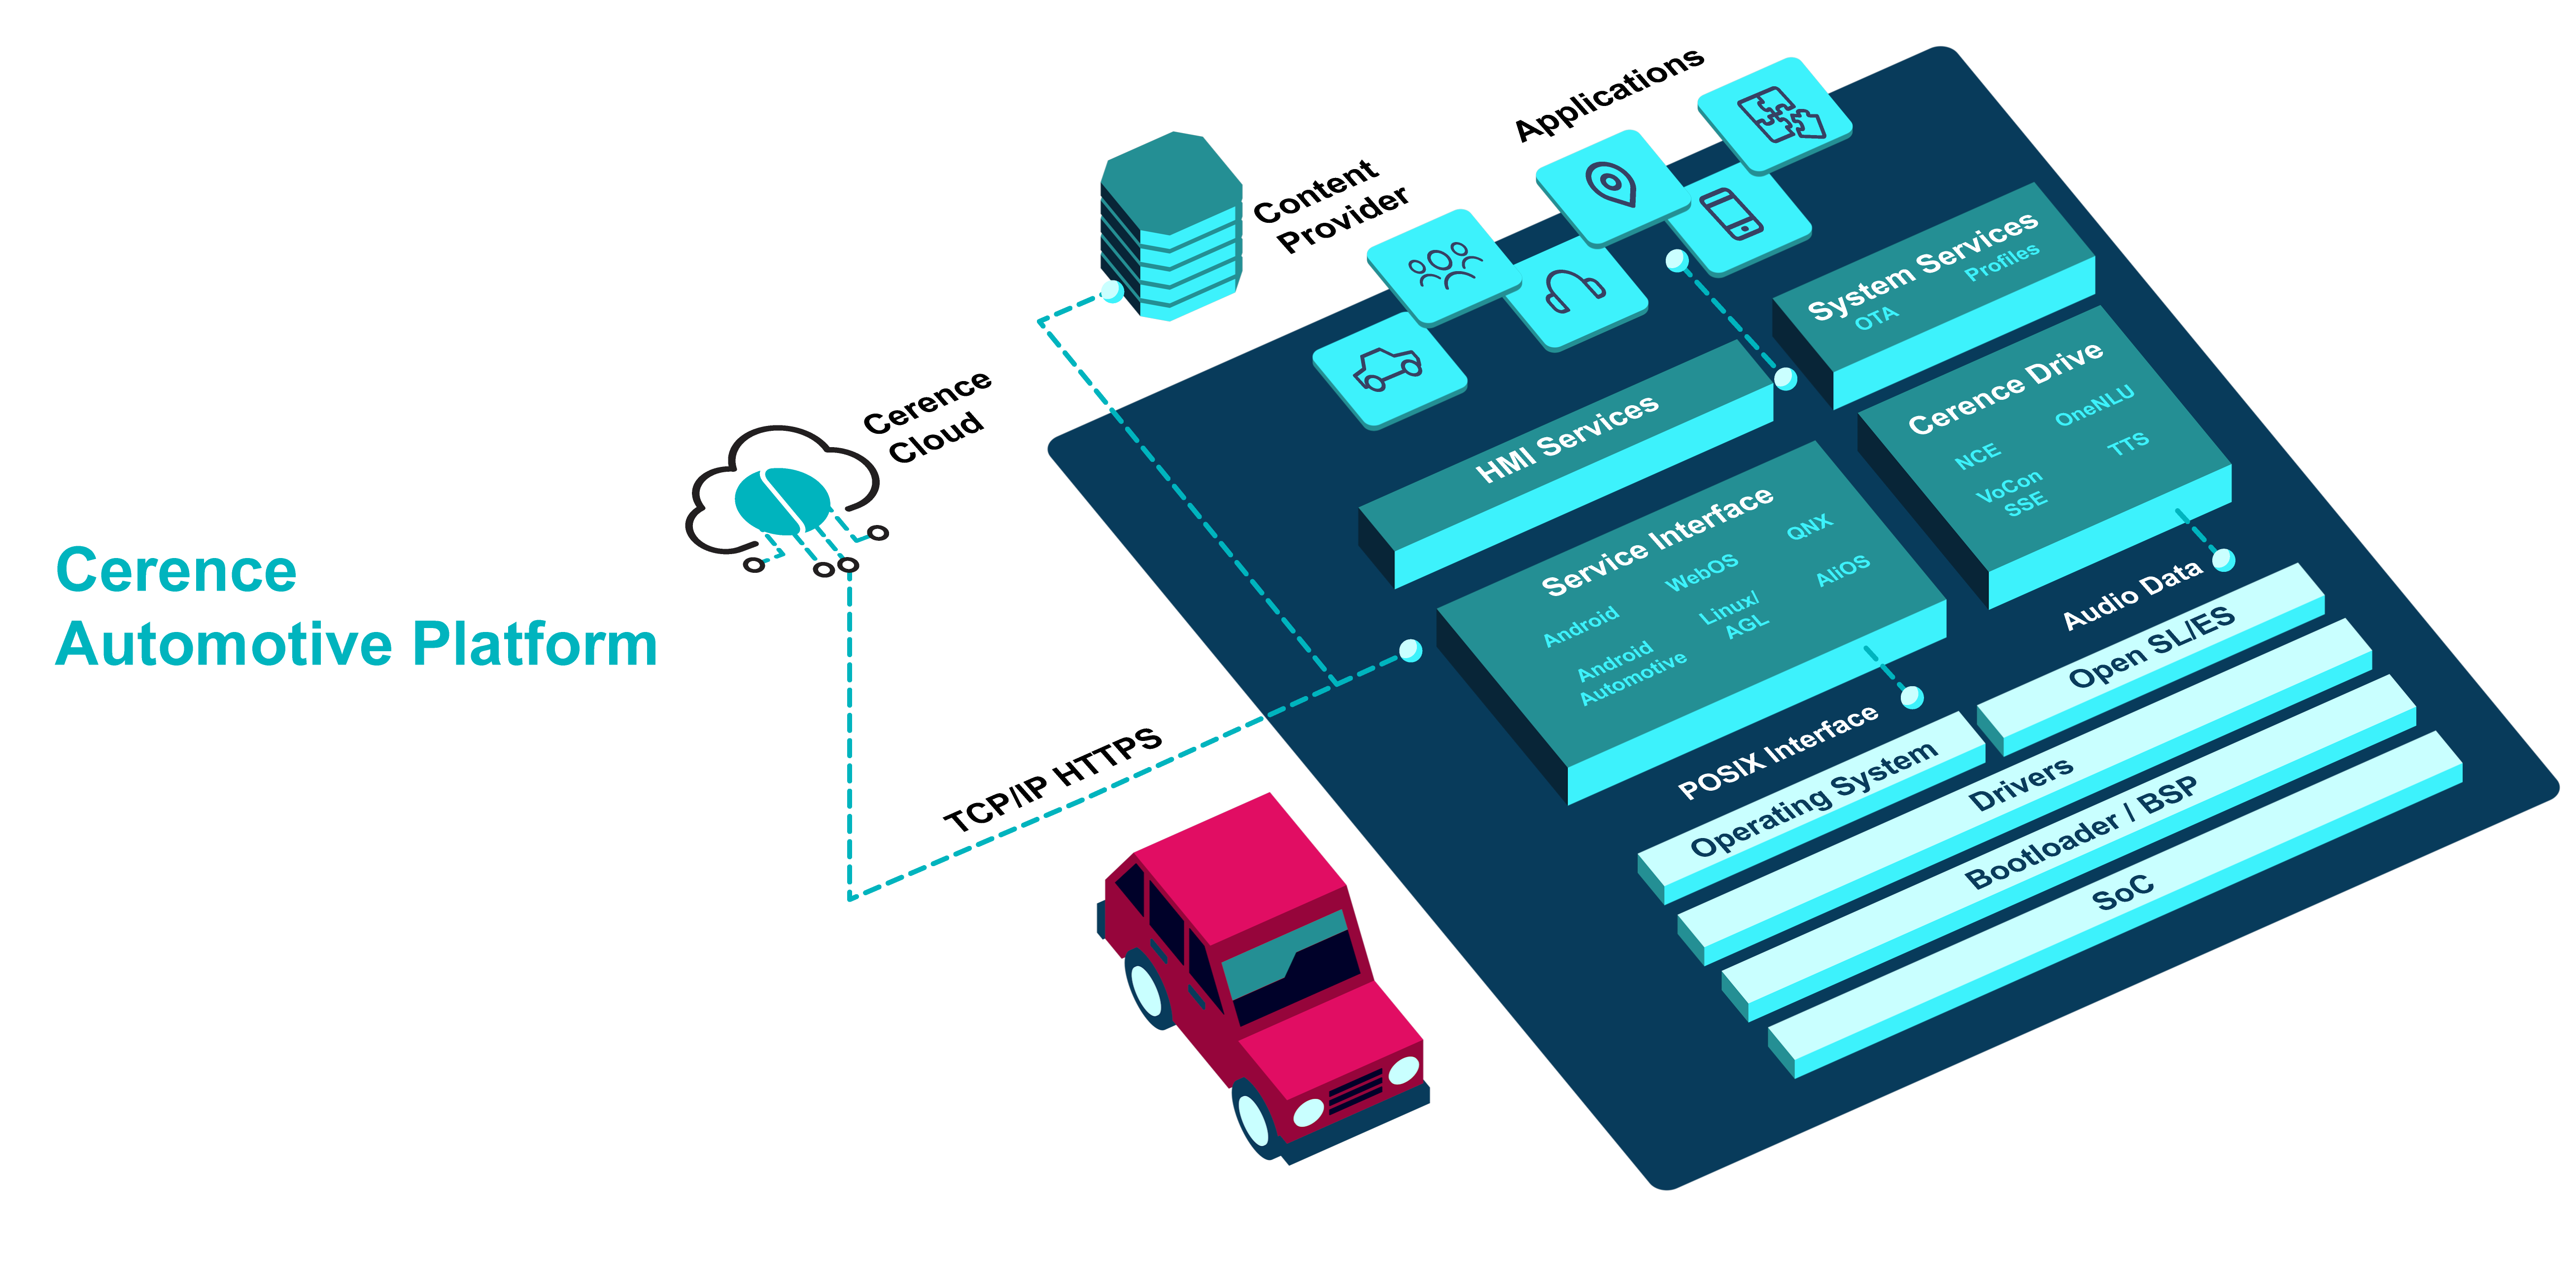 Cerence Automotive Platform